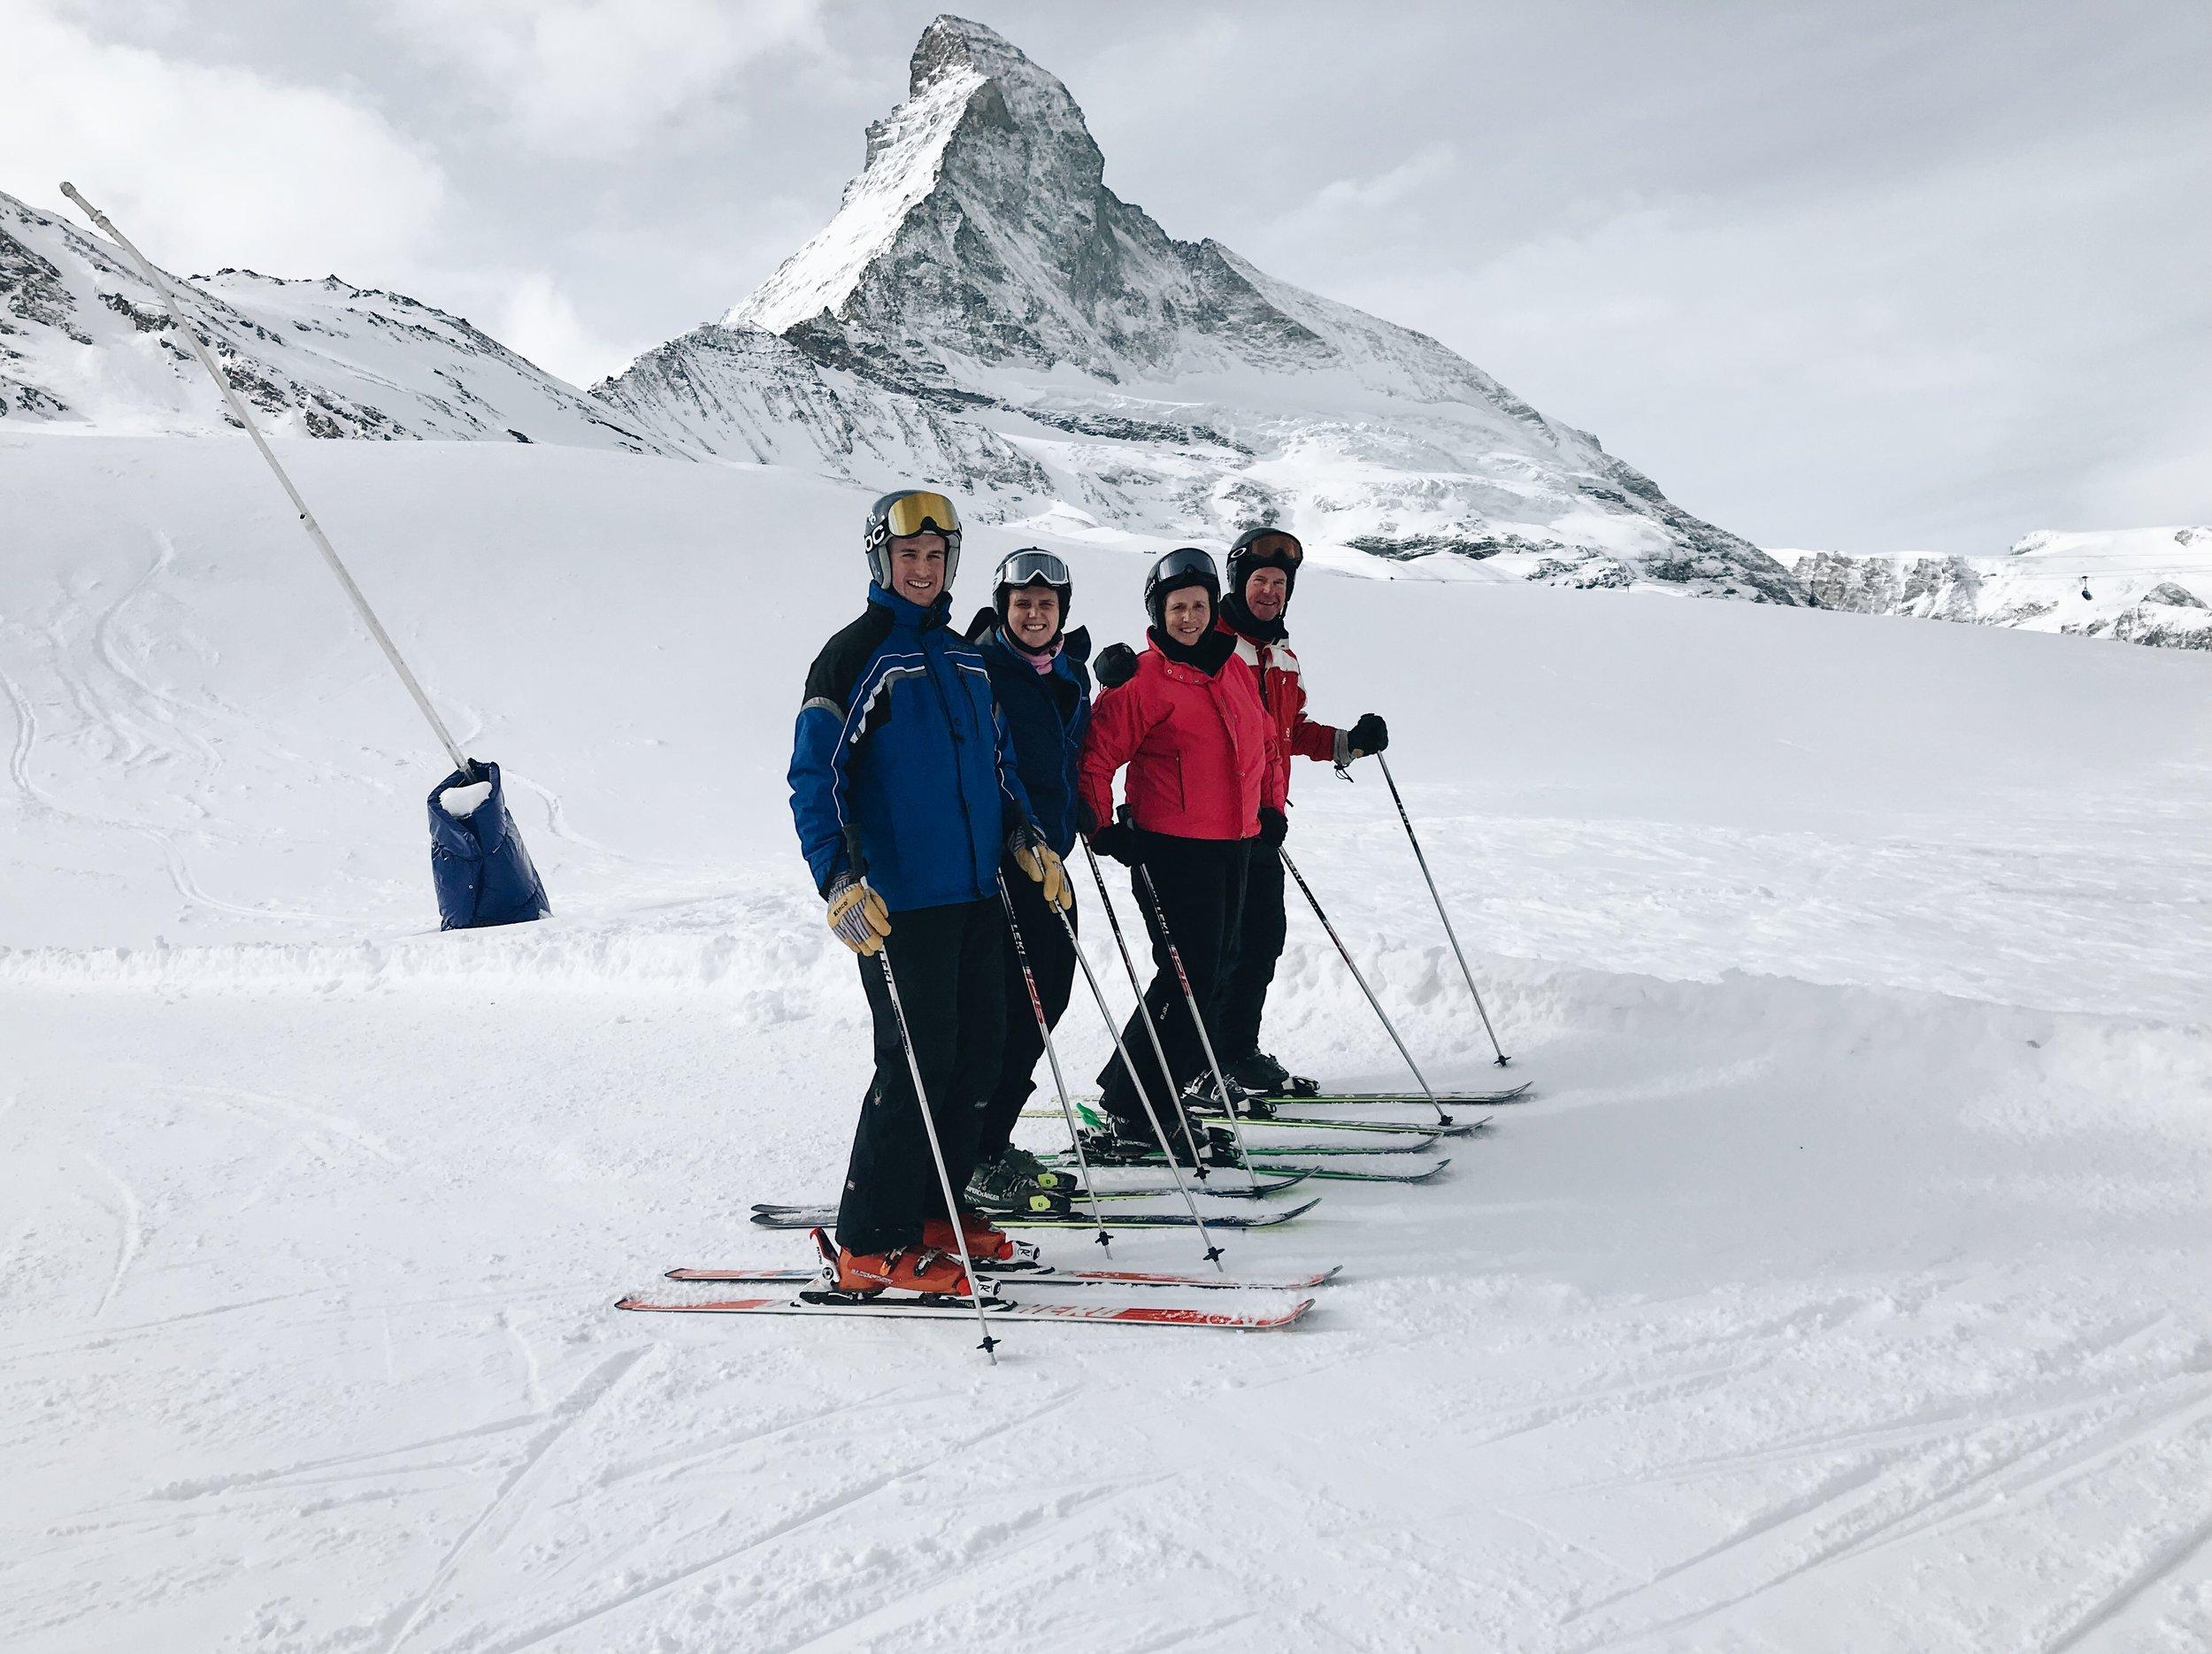 Zermatt-15.jpg